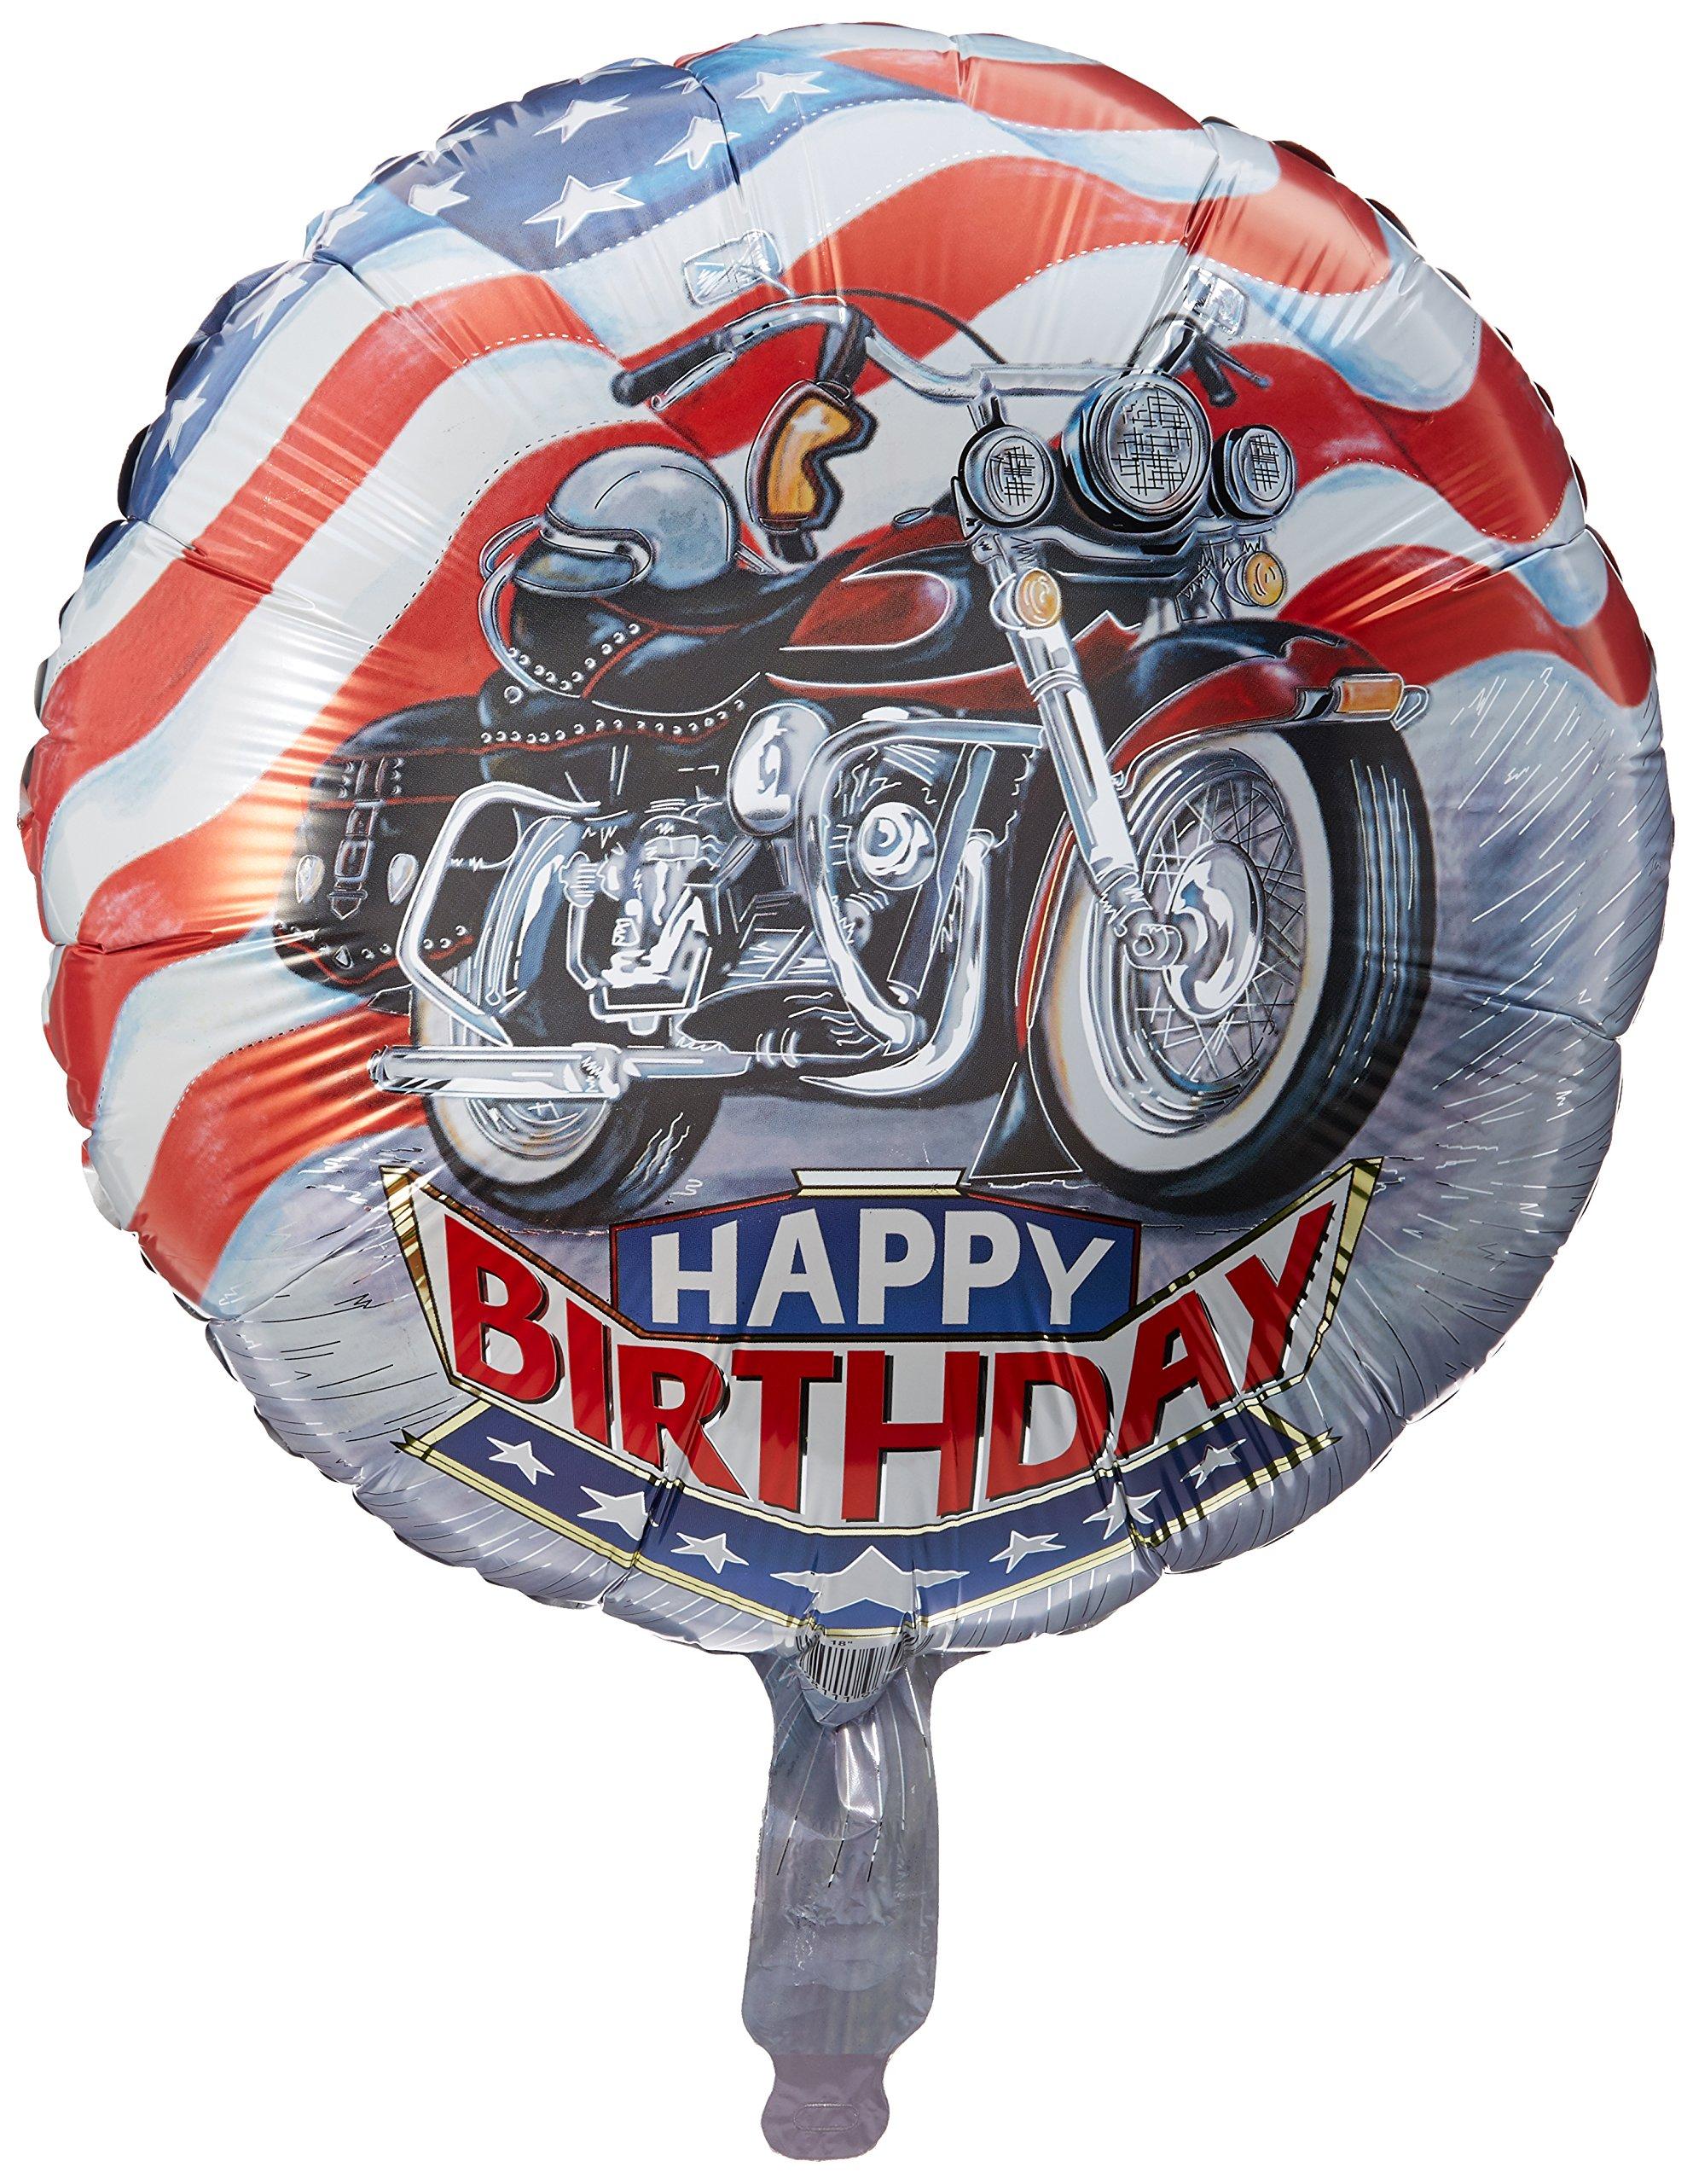 Harley Happy Birthday Mylar Balloon 18 Motorcycle